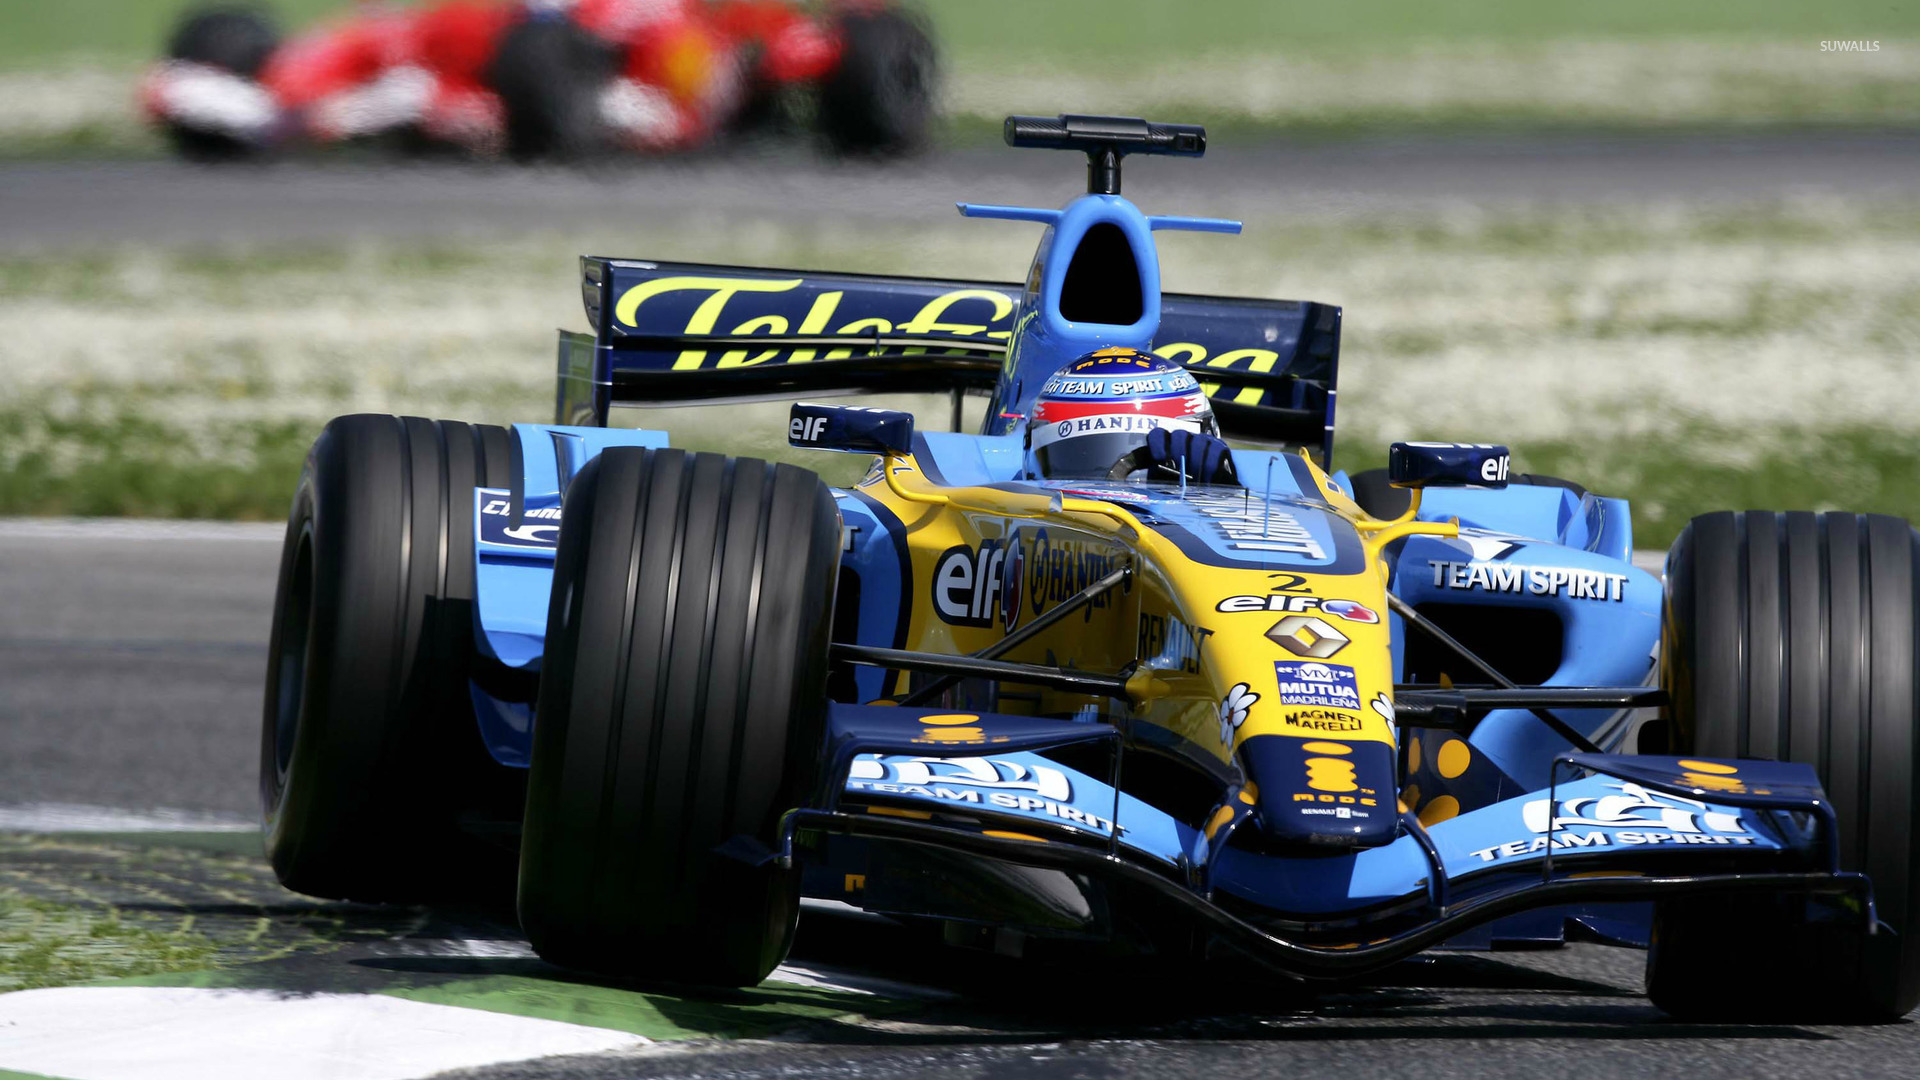 Fernando Alonso wallpaper   Sport wallpapers   29942 1920x1080